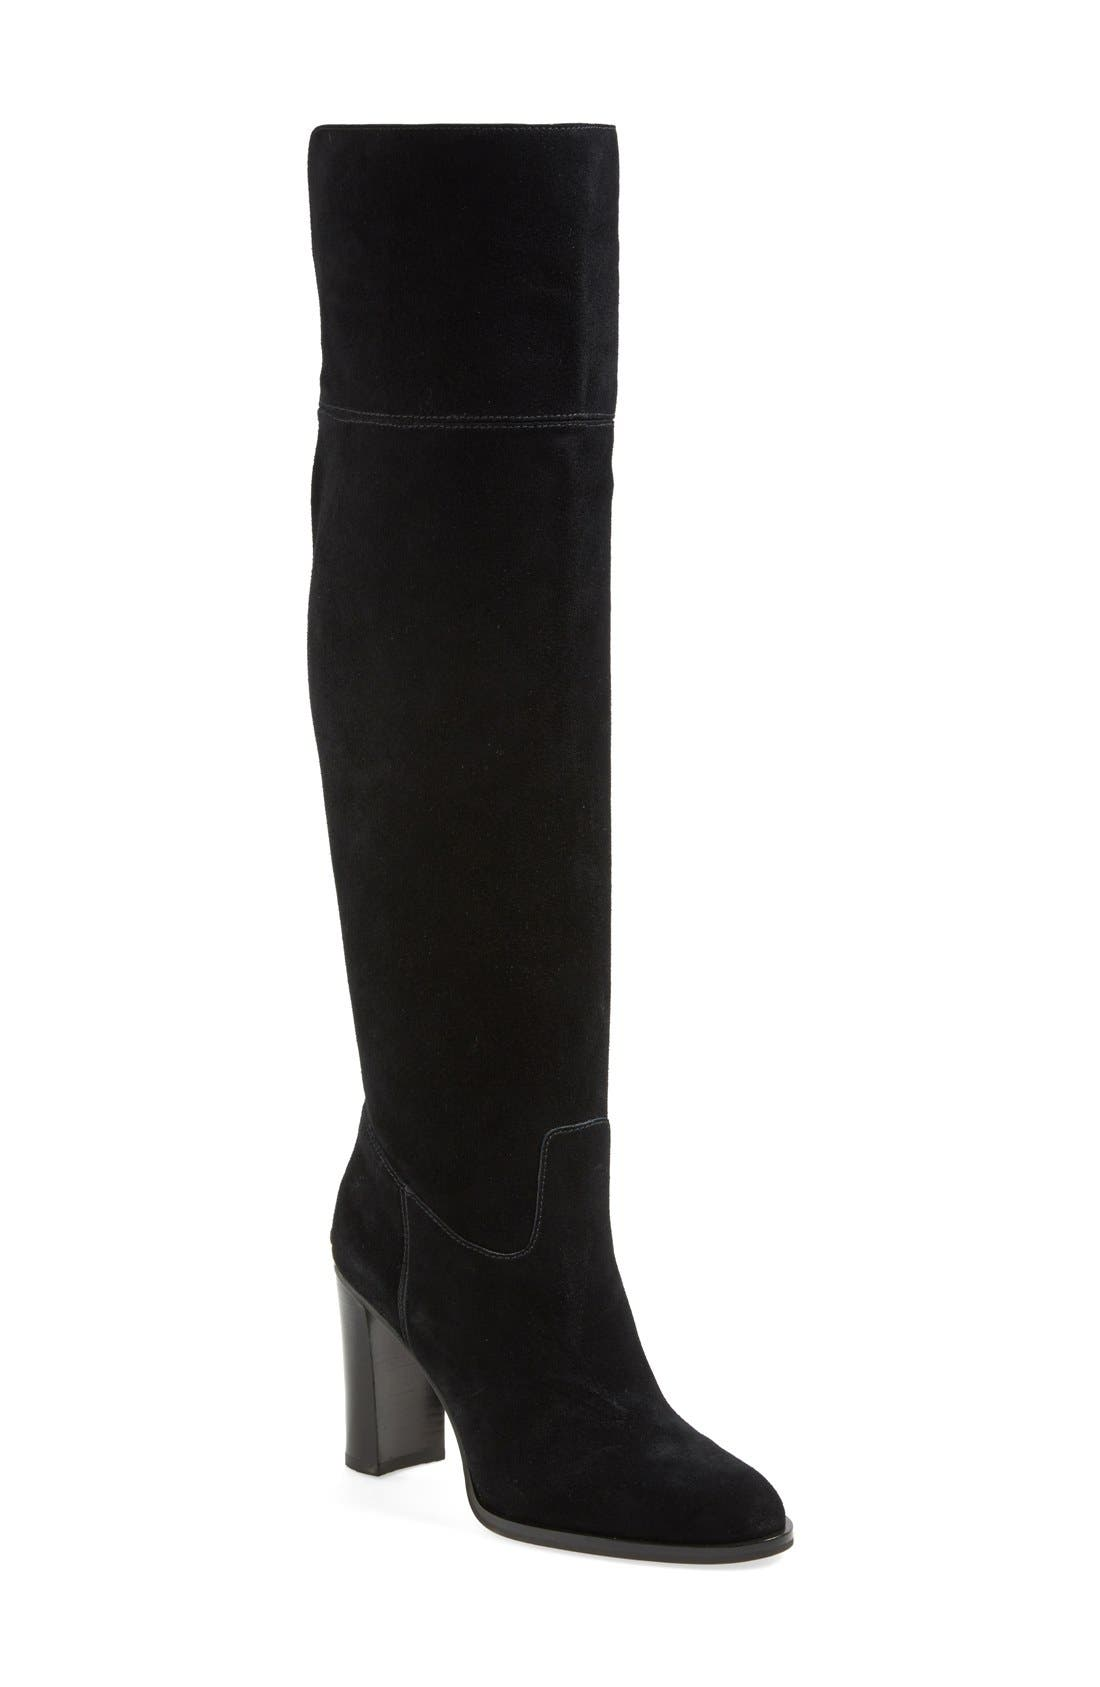 Main Image - MICHAEL Michael Kors 'Regina' Over the Knee Boot (Women)